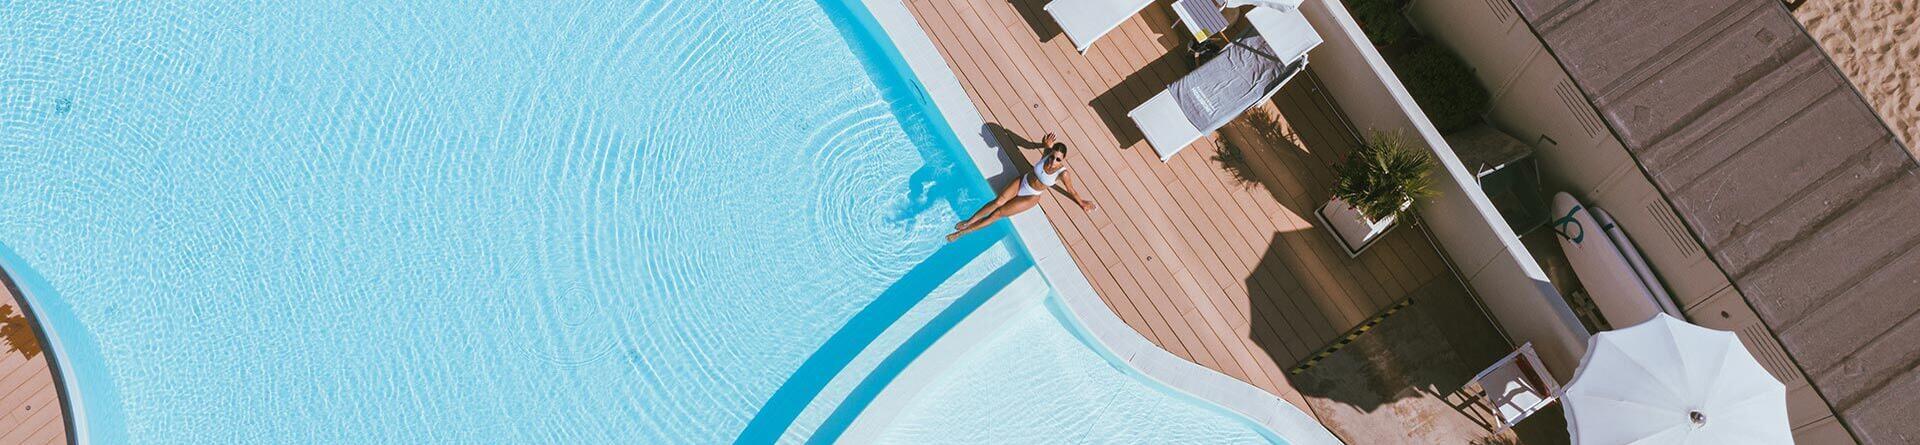 hotelnautiluspesaro en hotel-with-pool-in-pesaro 008